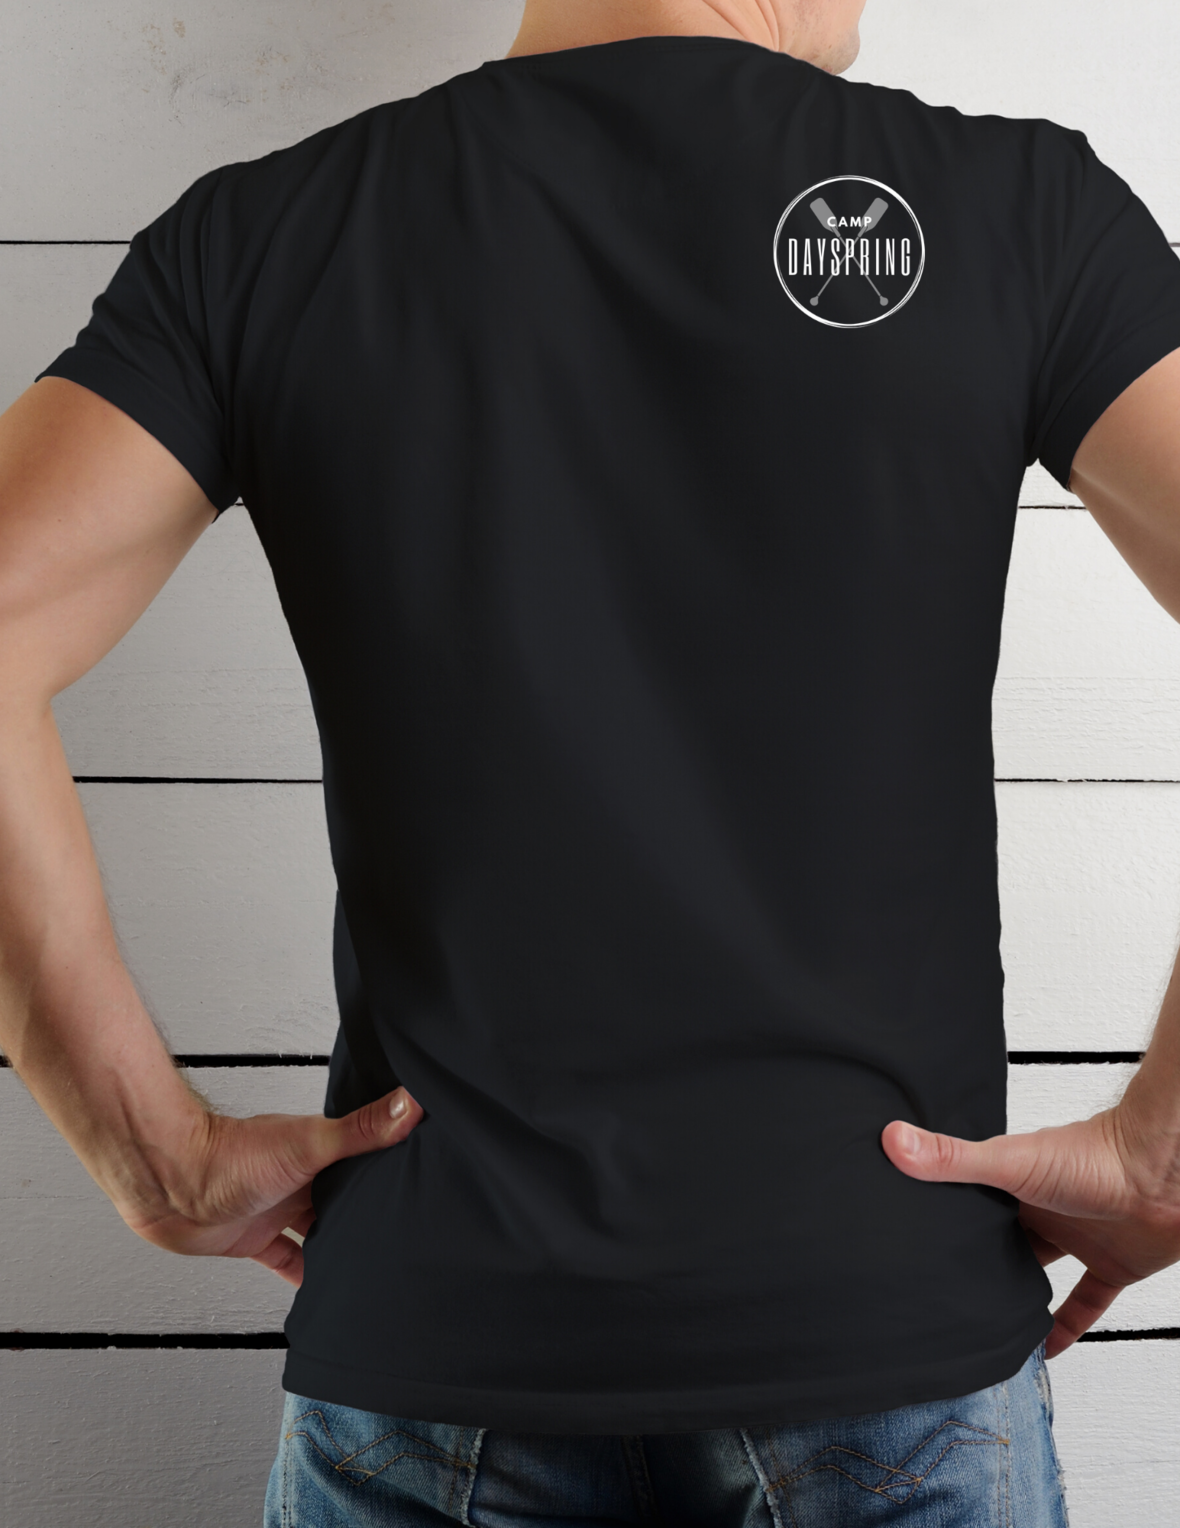 Camp T-shirt Design 2020 Shown-3